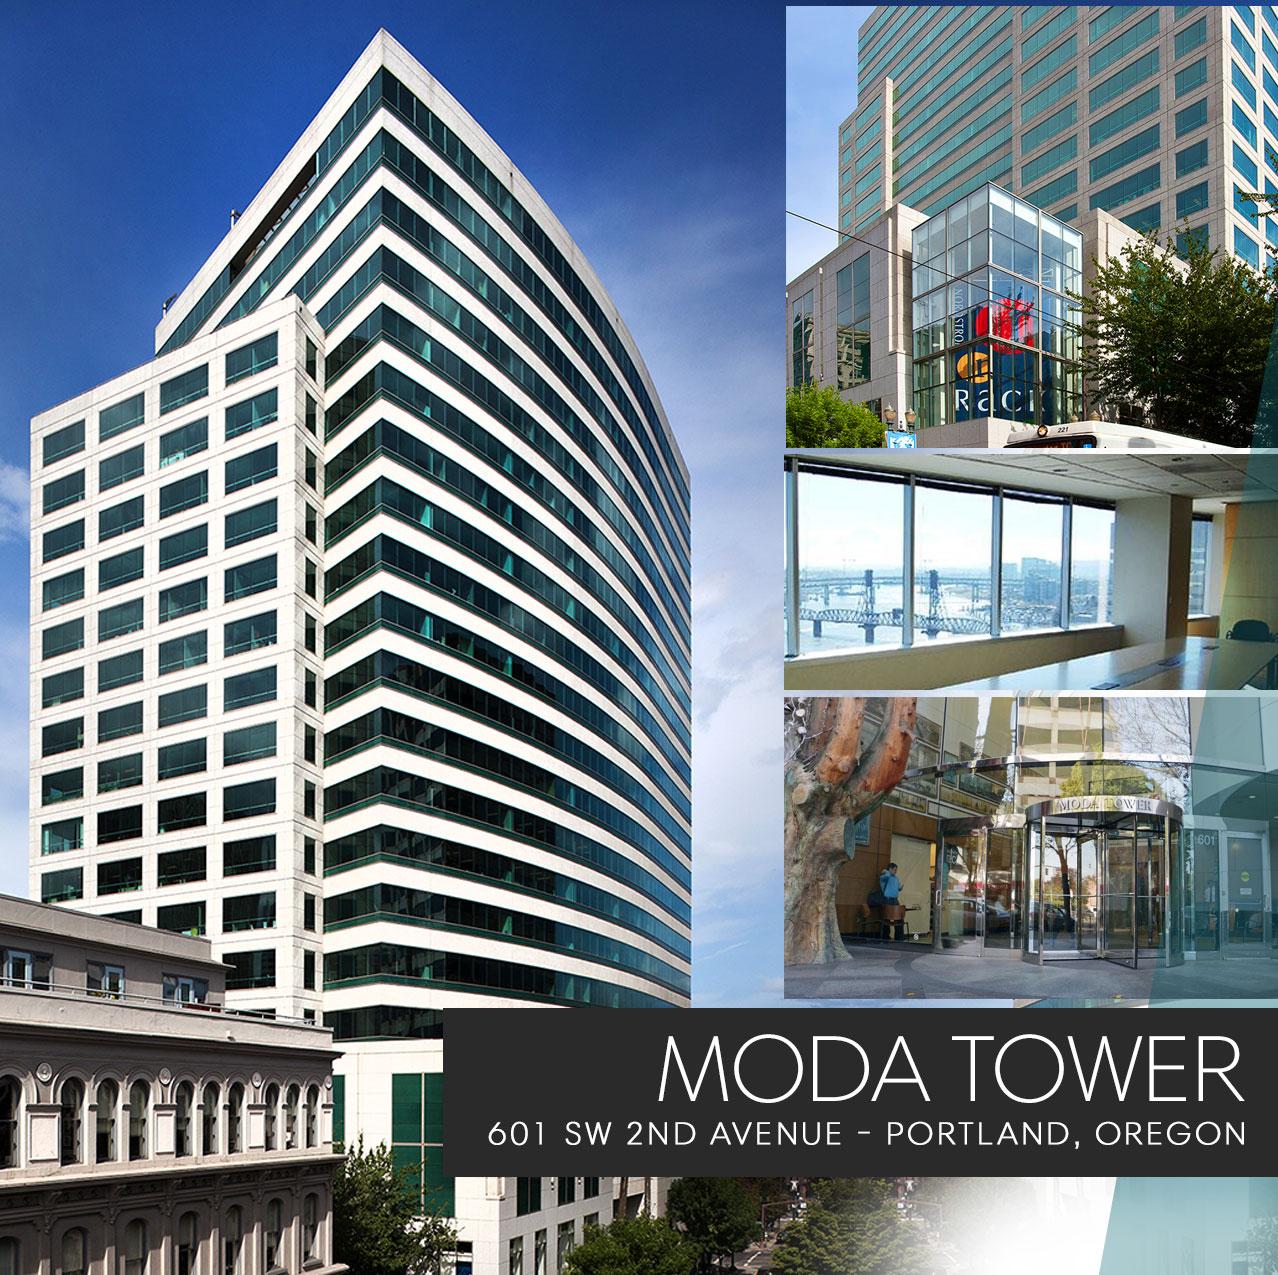 Moda Tower